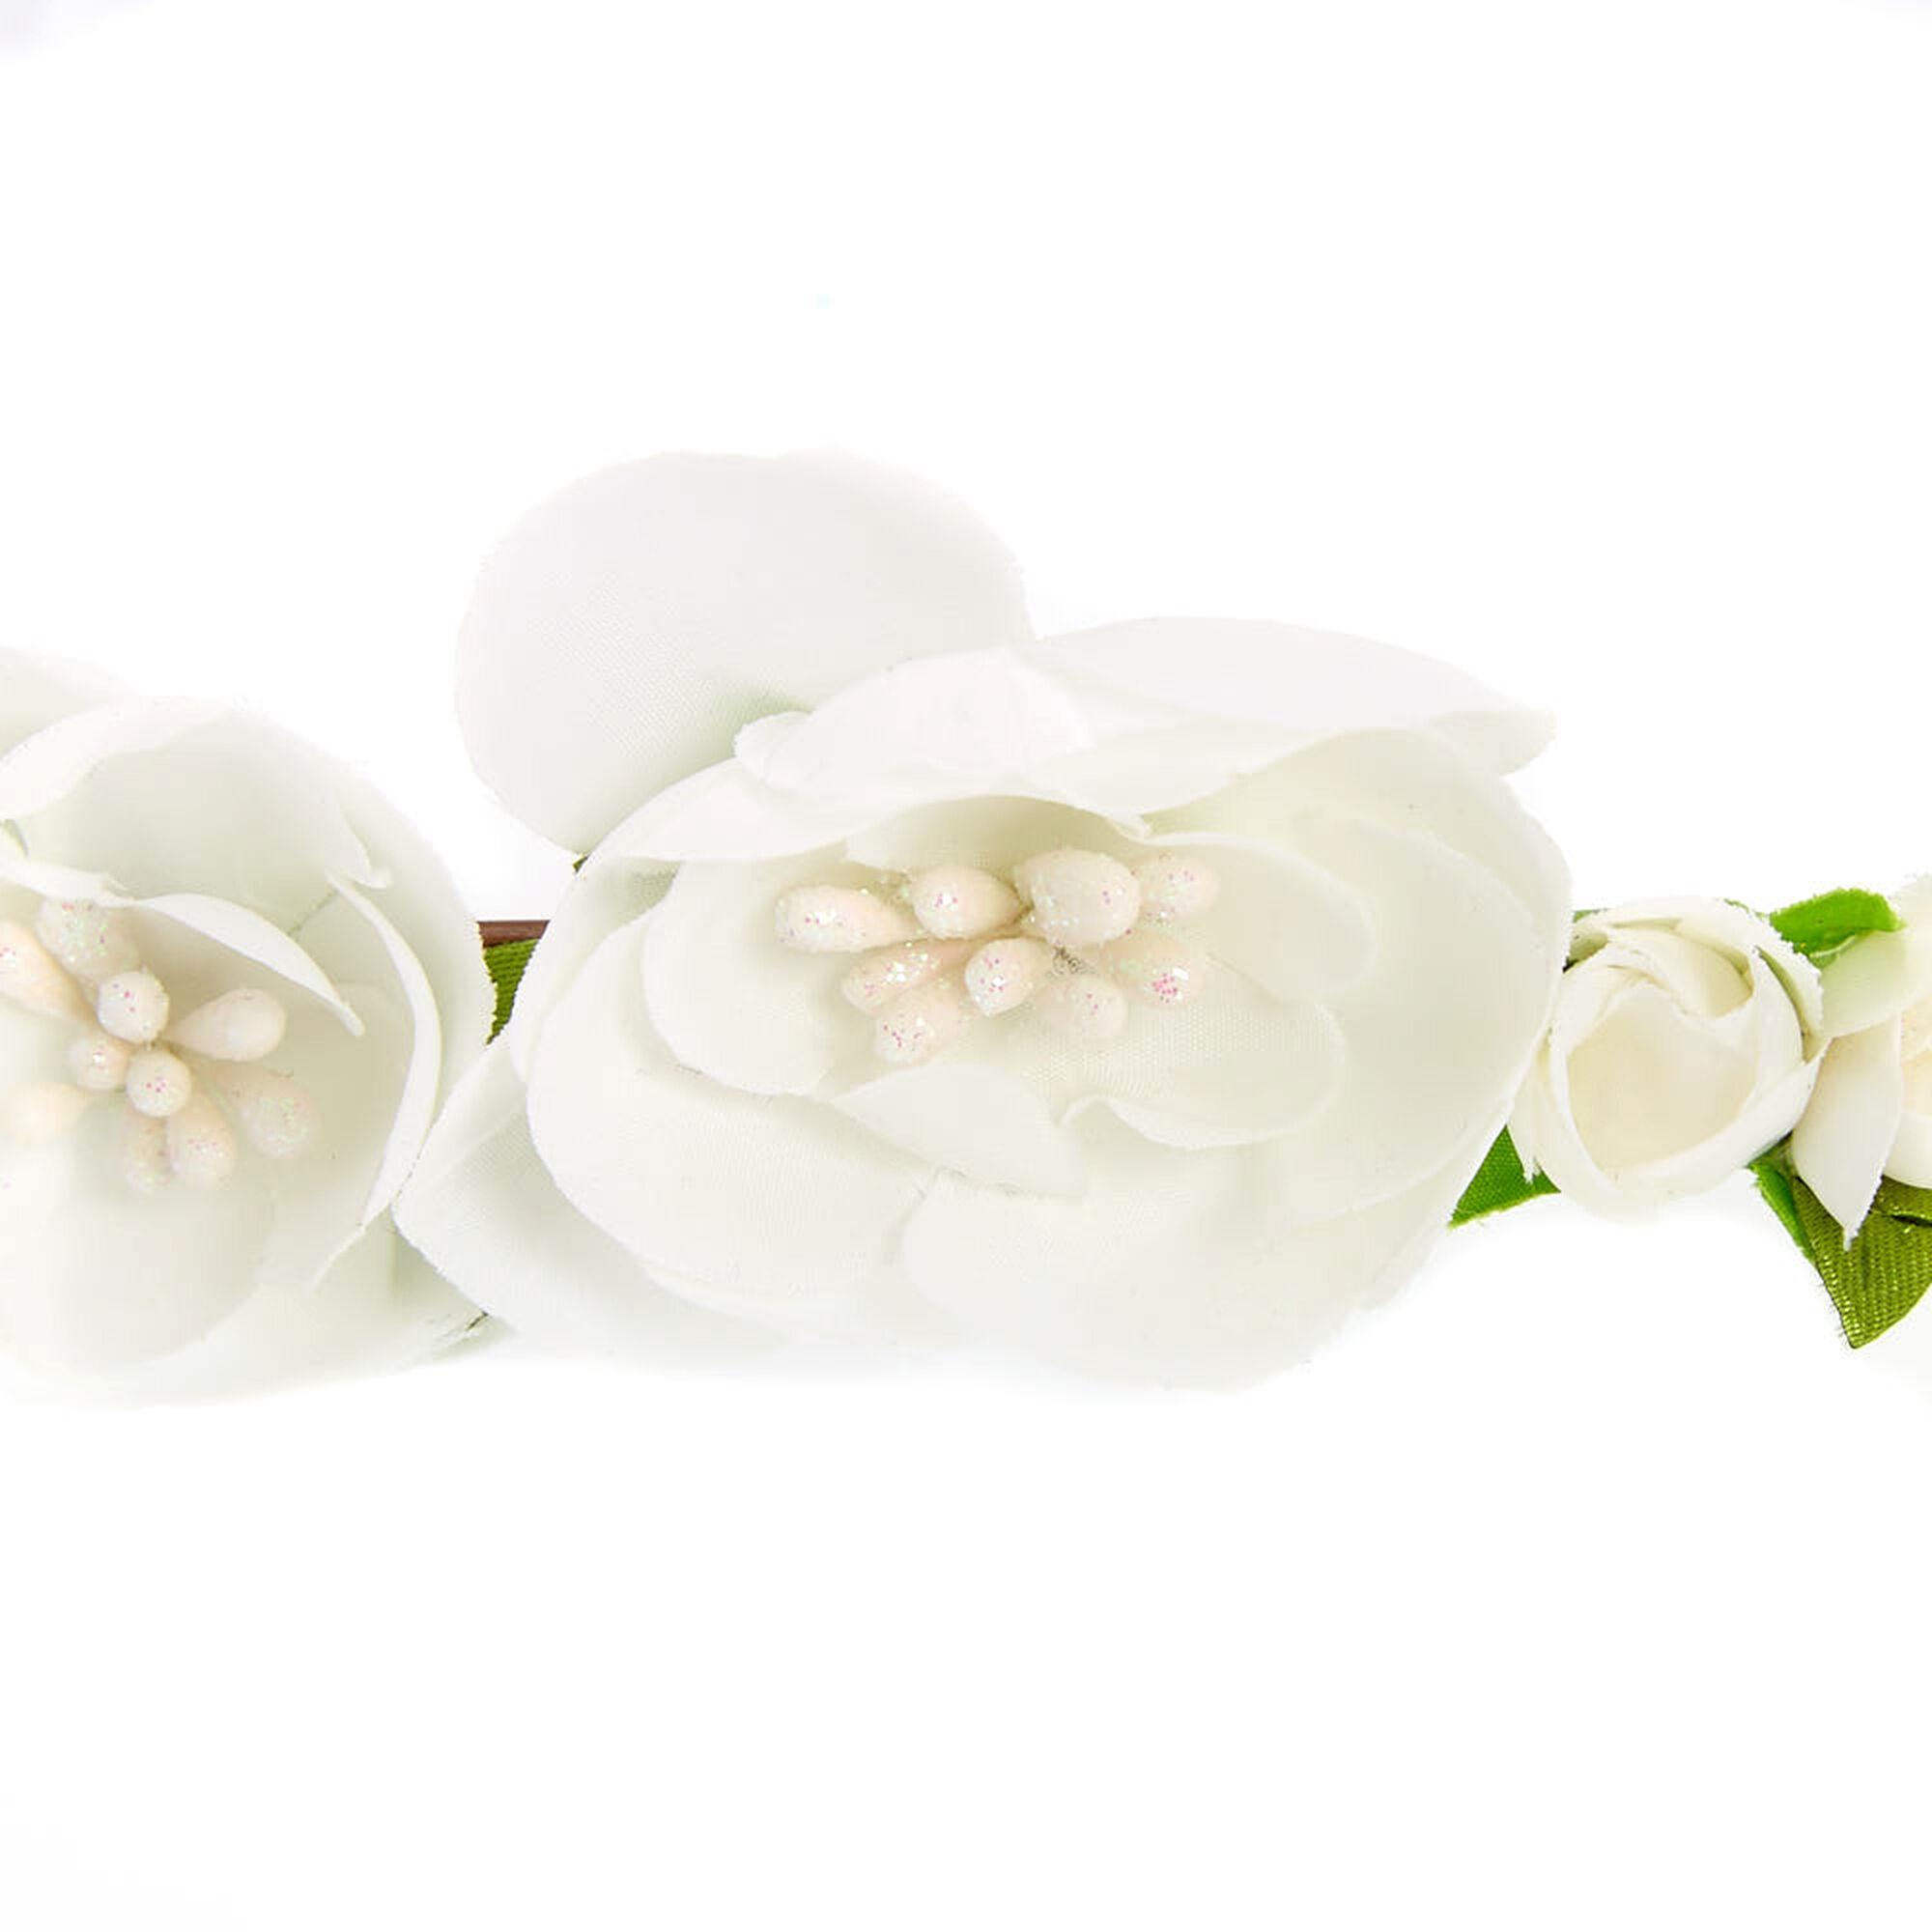 Claires club flower girl flower garland veil white claires us claire39s club flower girl flower garland veil white mightylinksfo